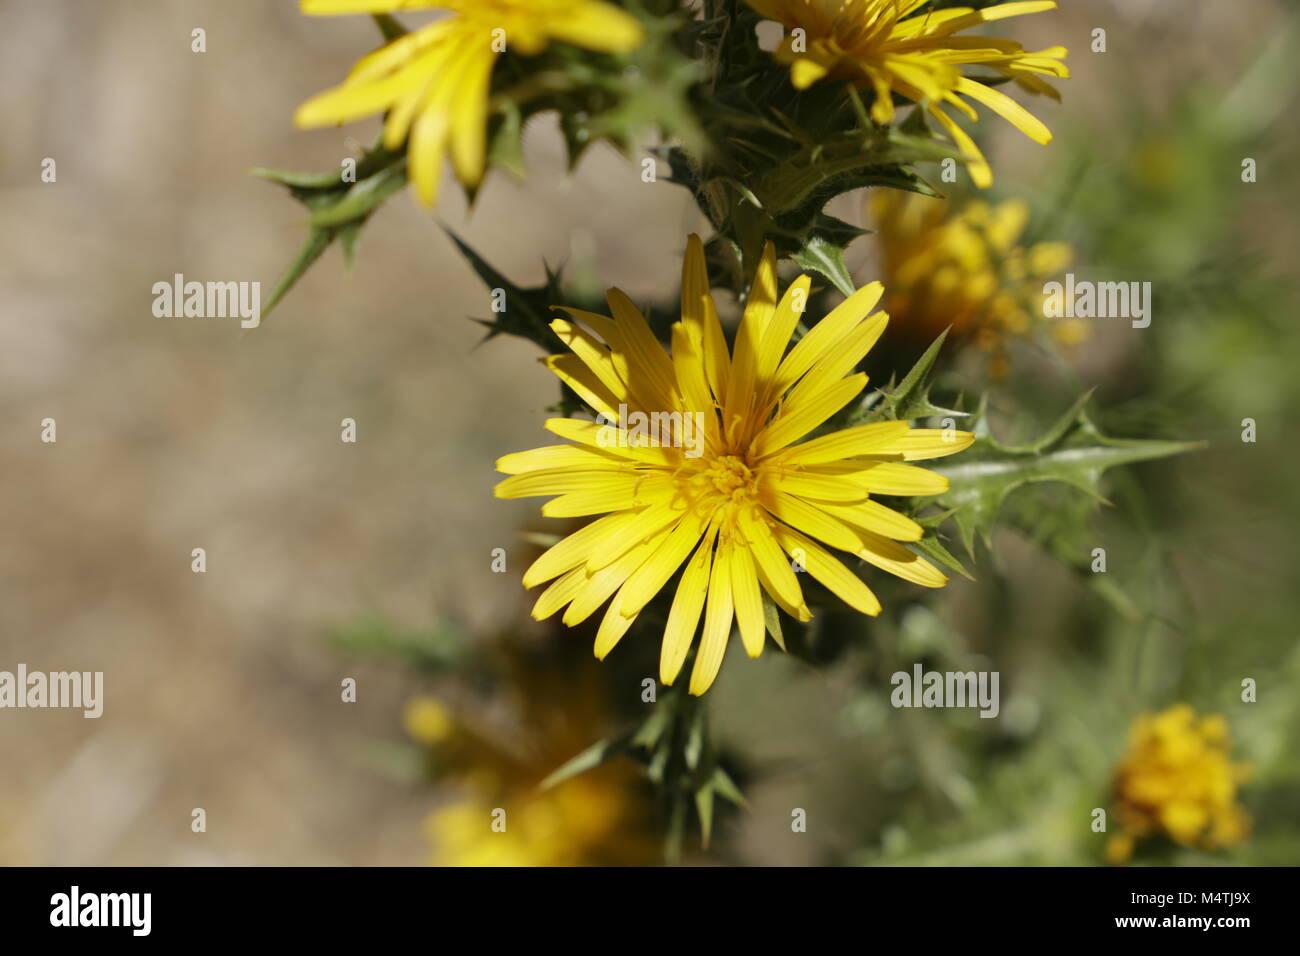 Yellow Thistle Flowers Stock Photos Yellow Thistle Flowers Stock